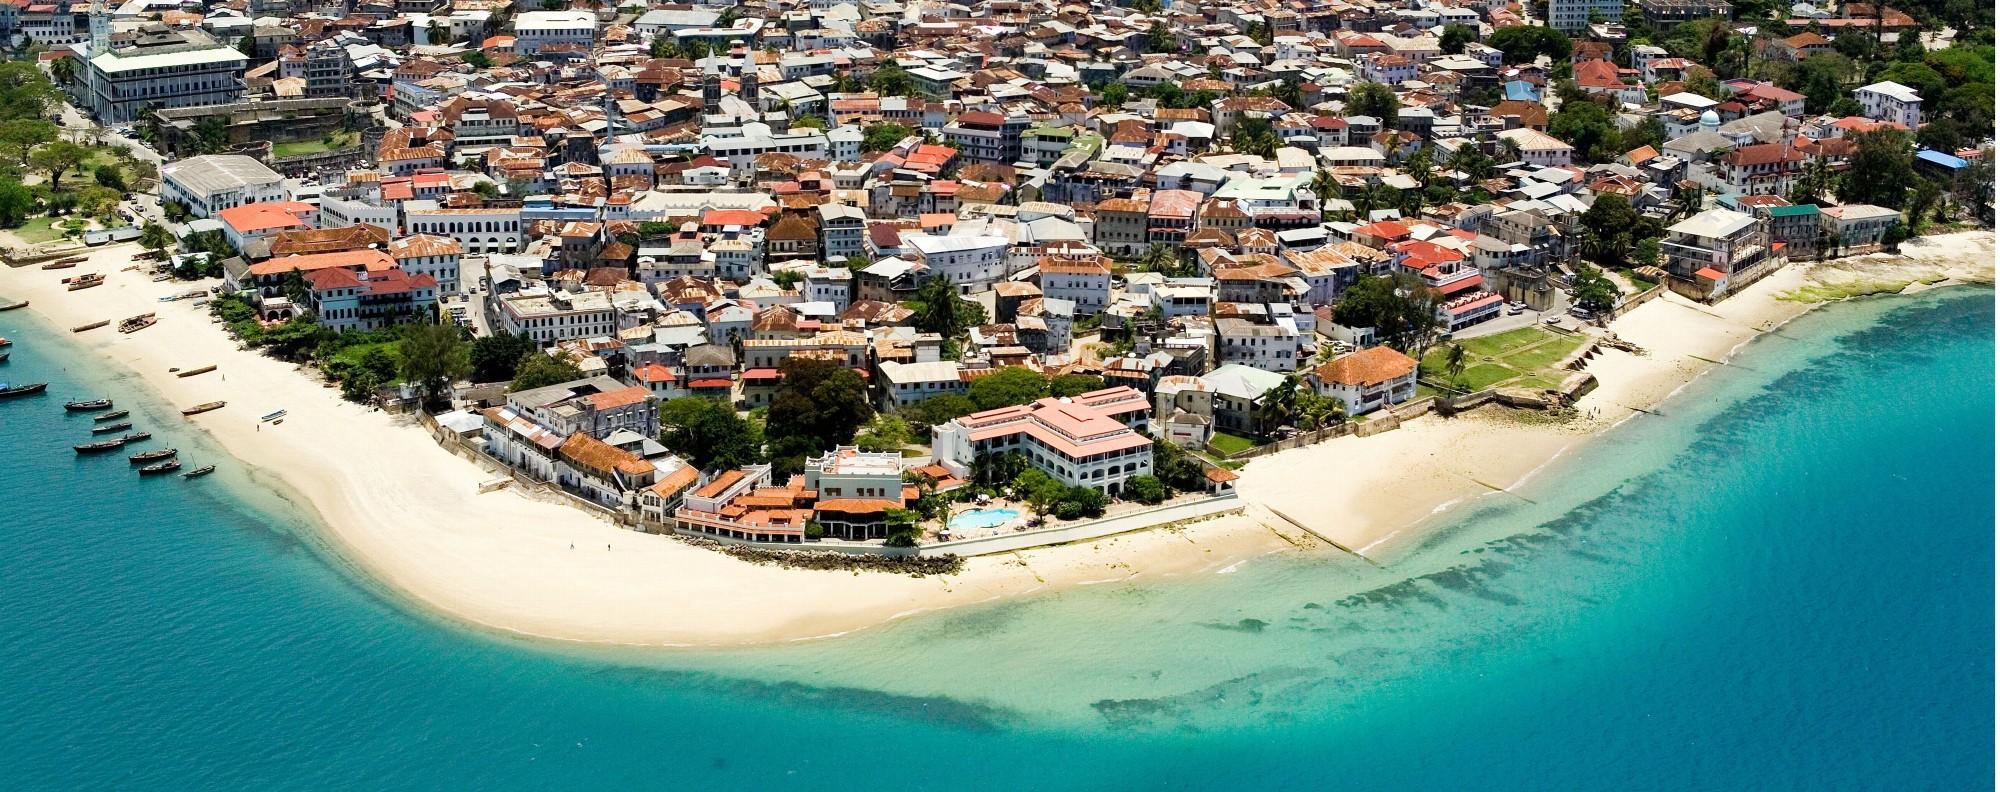 Stone Town, Zanzibar. Picture: Alamy